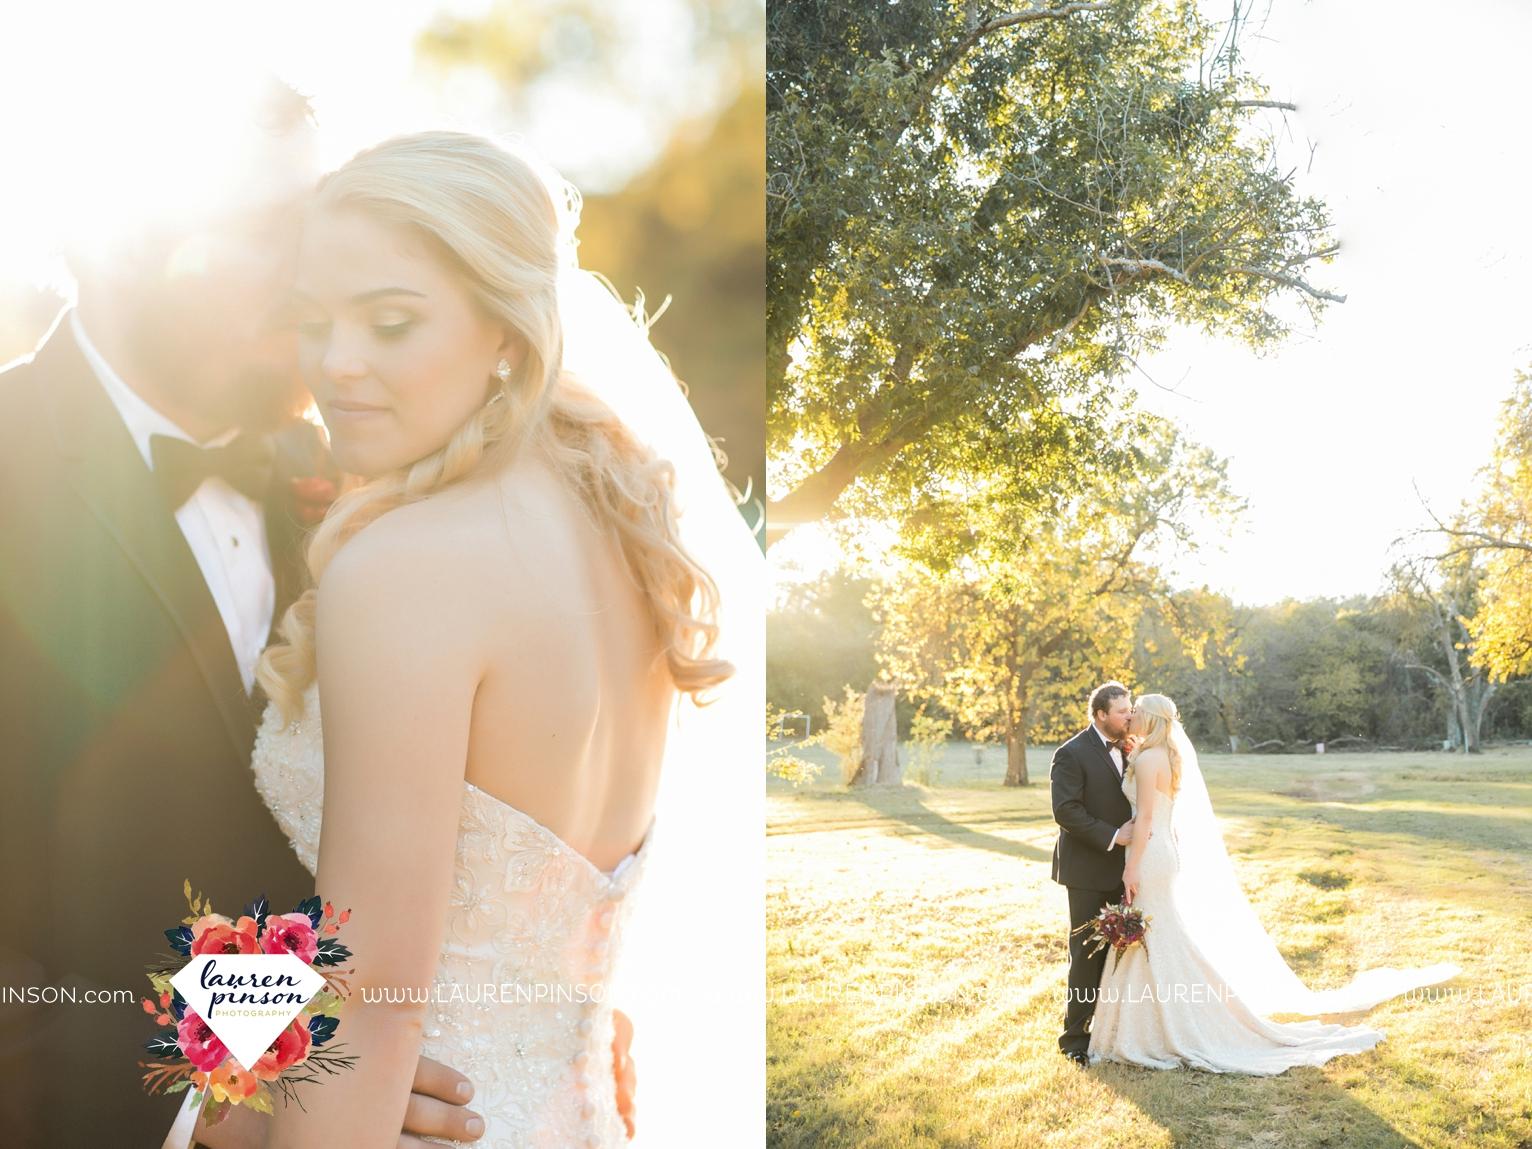 rustic-wichita-falls-texas-wedding-photographer-gold-glam-mayfield-events-market-street-united-allue-bridals-fall_1773.jpg